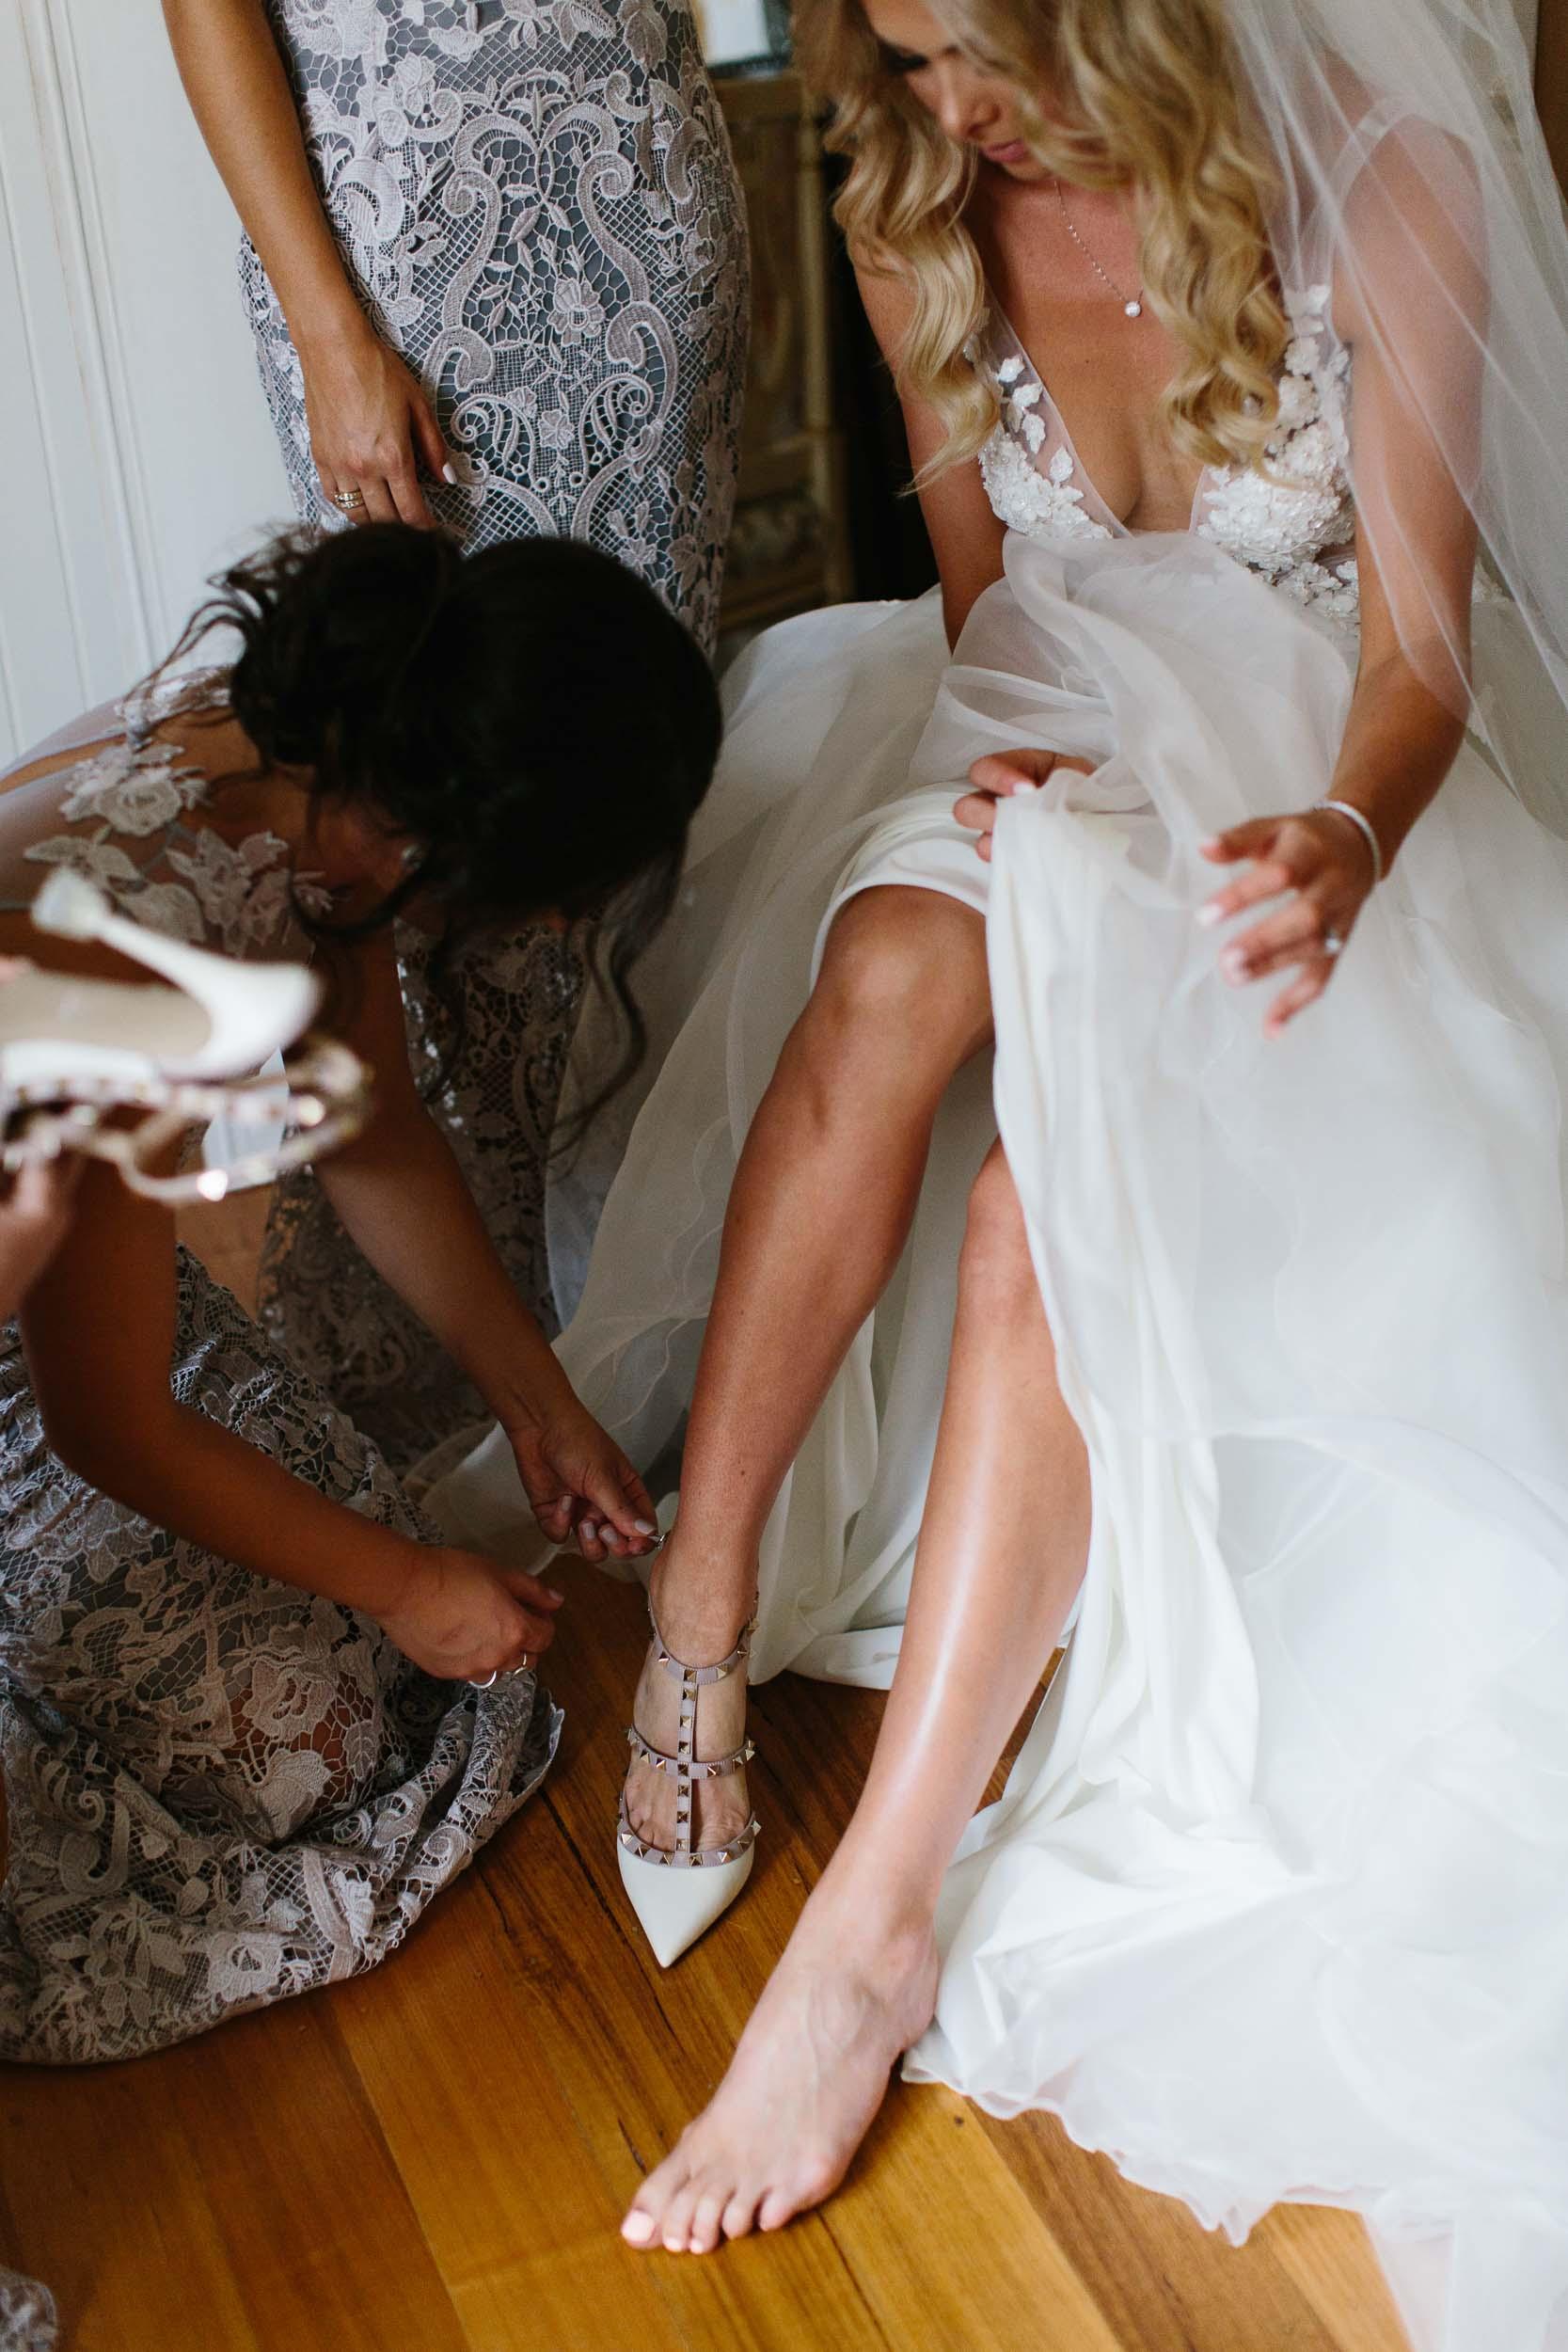 Kas-Richards-Mornington-Peninsula-Private-Property-Wedding-Marianna-Hardwick-Gown-108.jpg